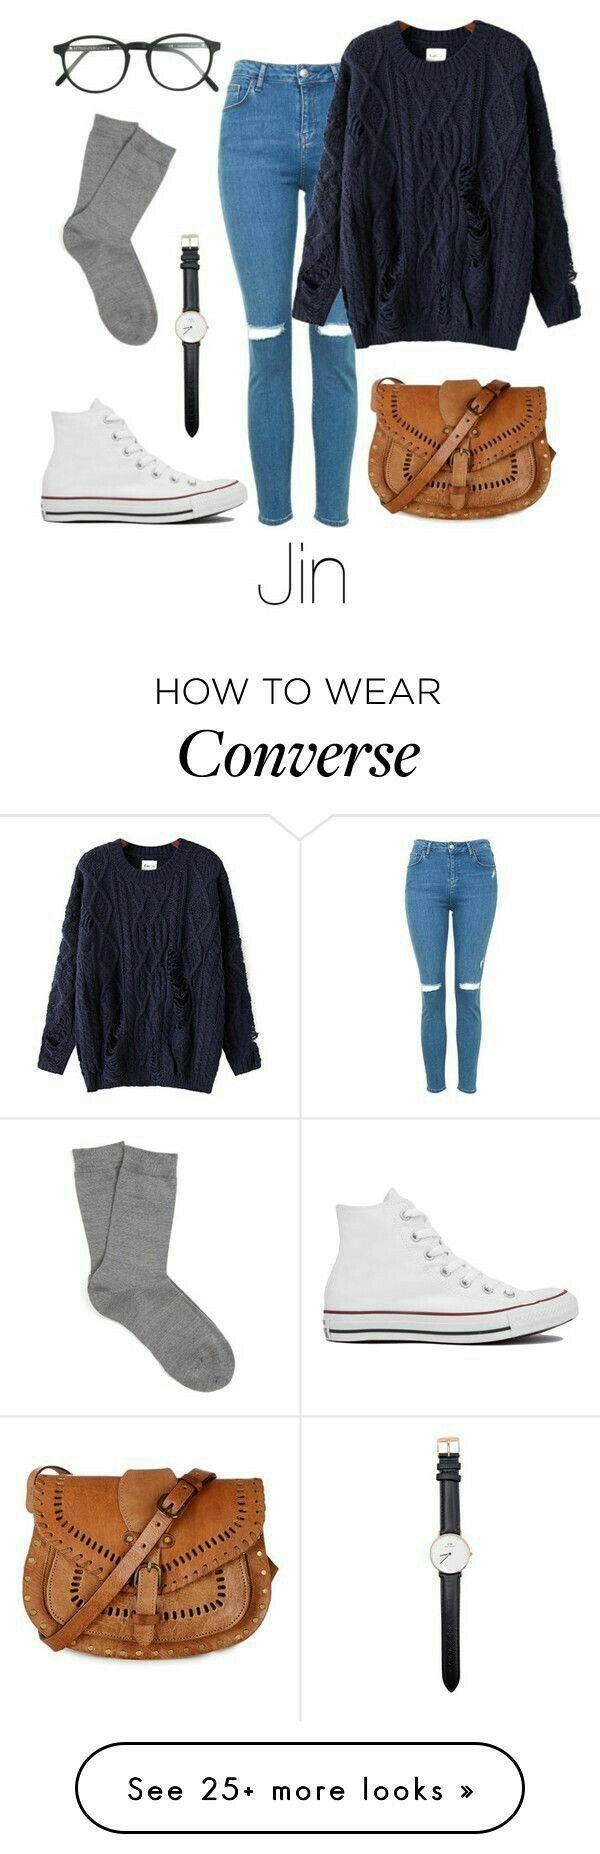 Wie trägt man converse / Jin